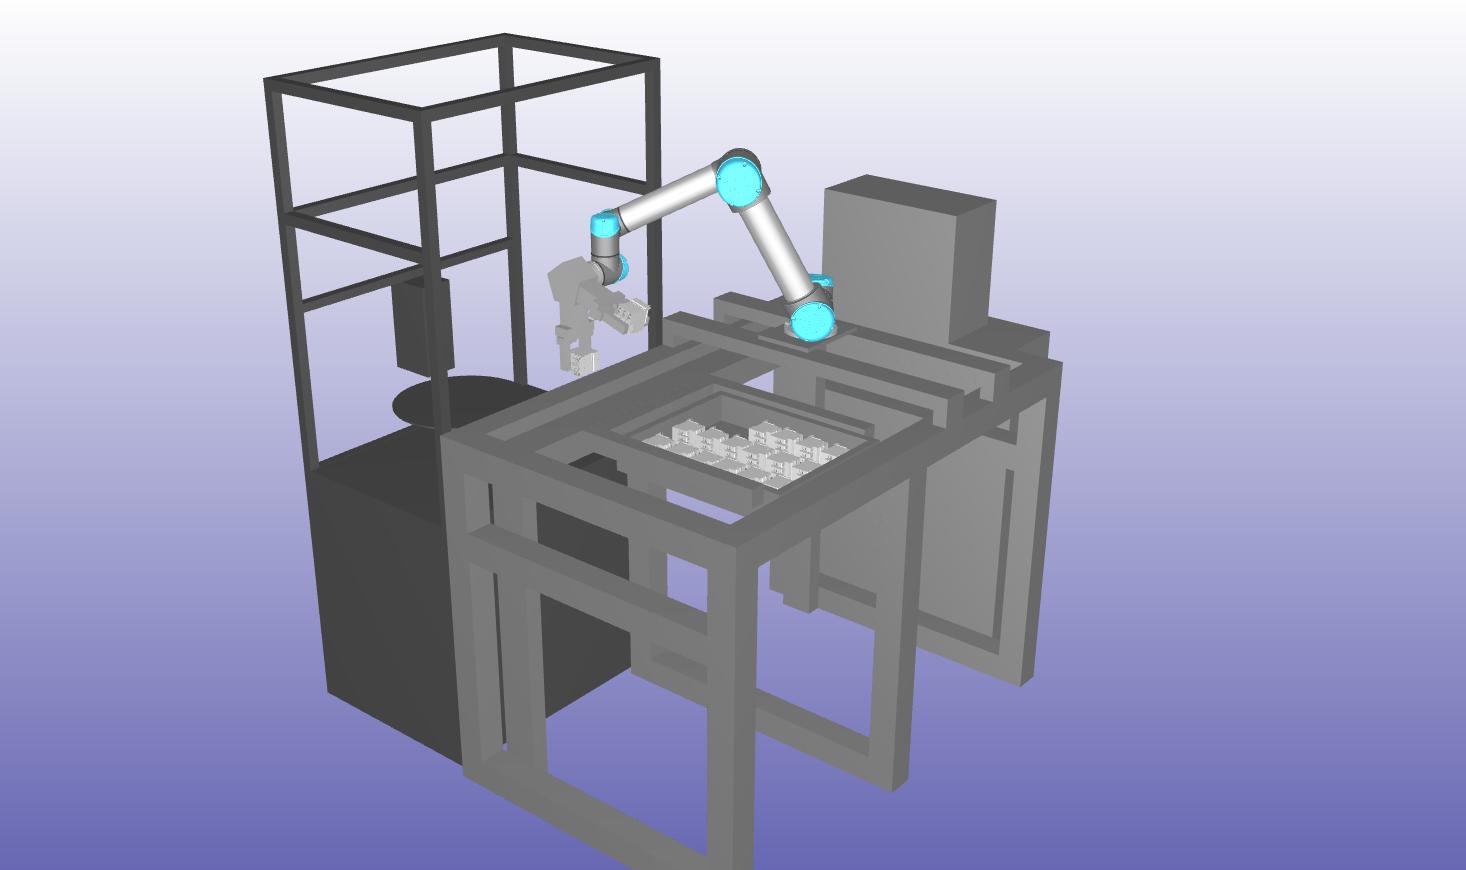 RoboDK導入後に作成したレイアウト設計イメージ